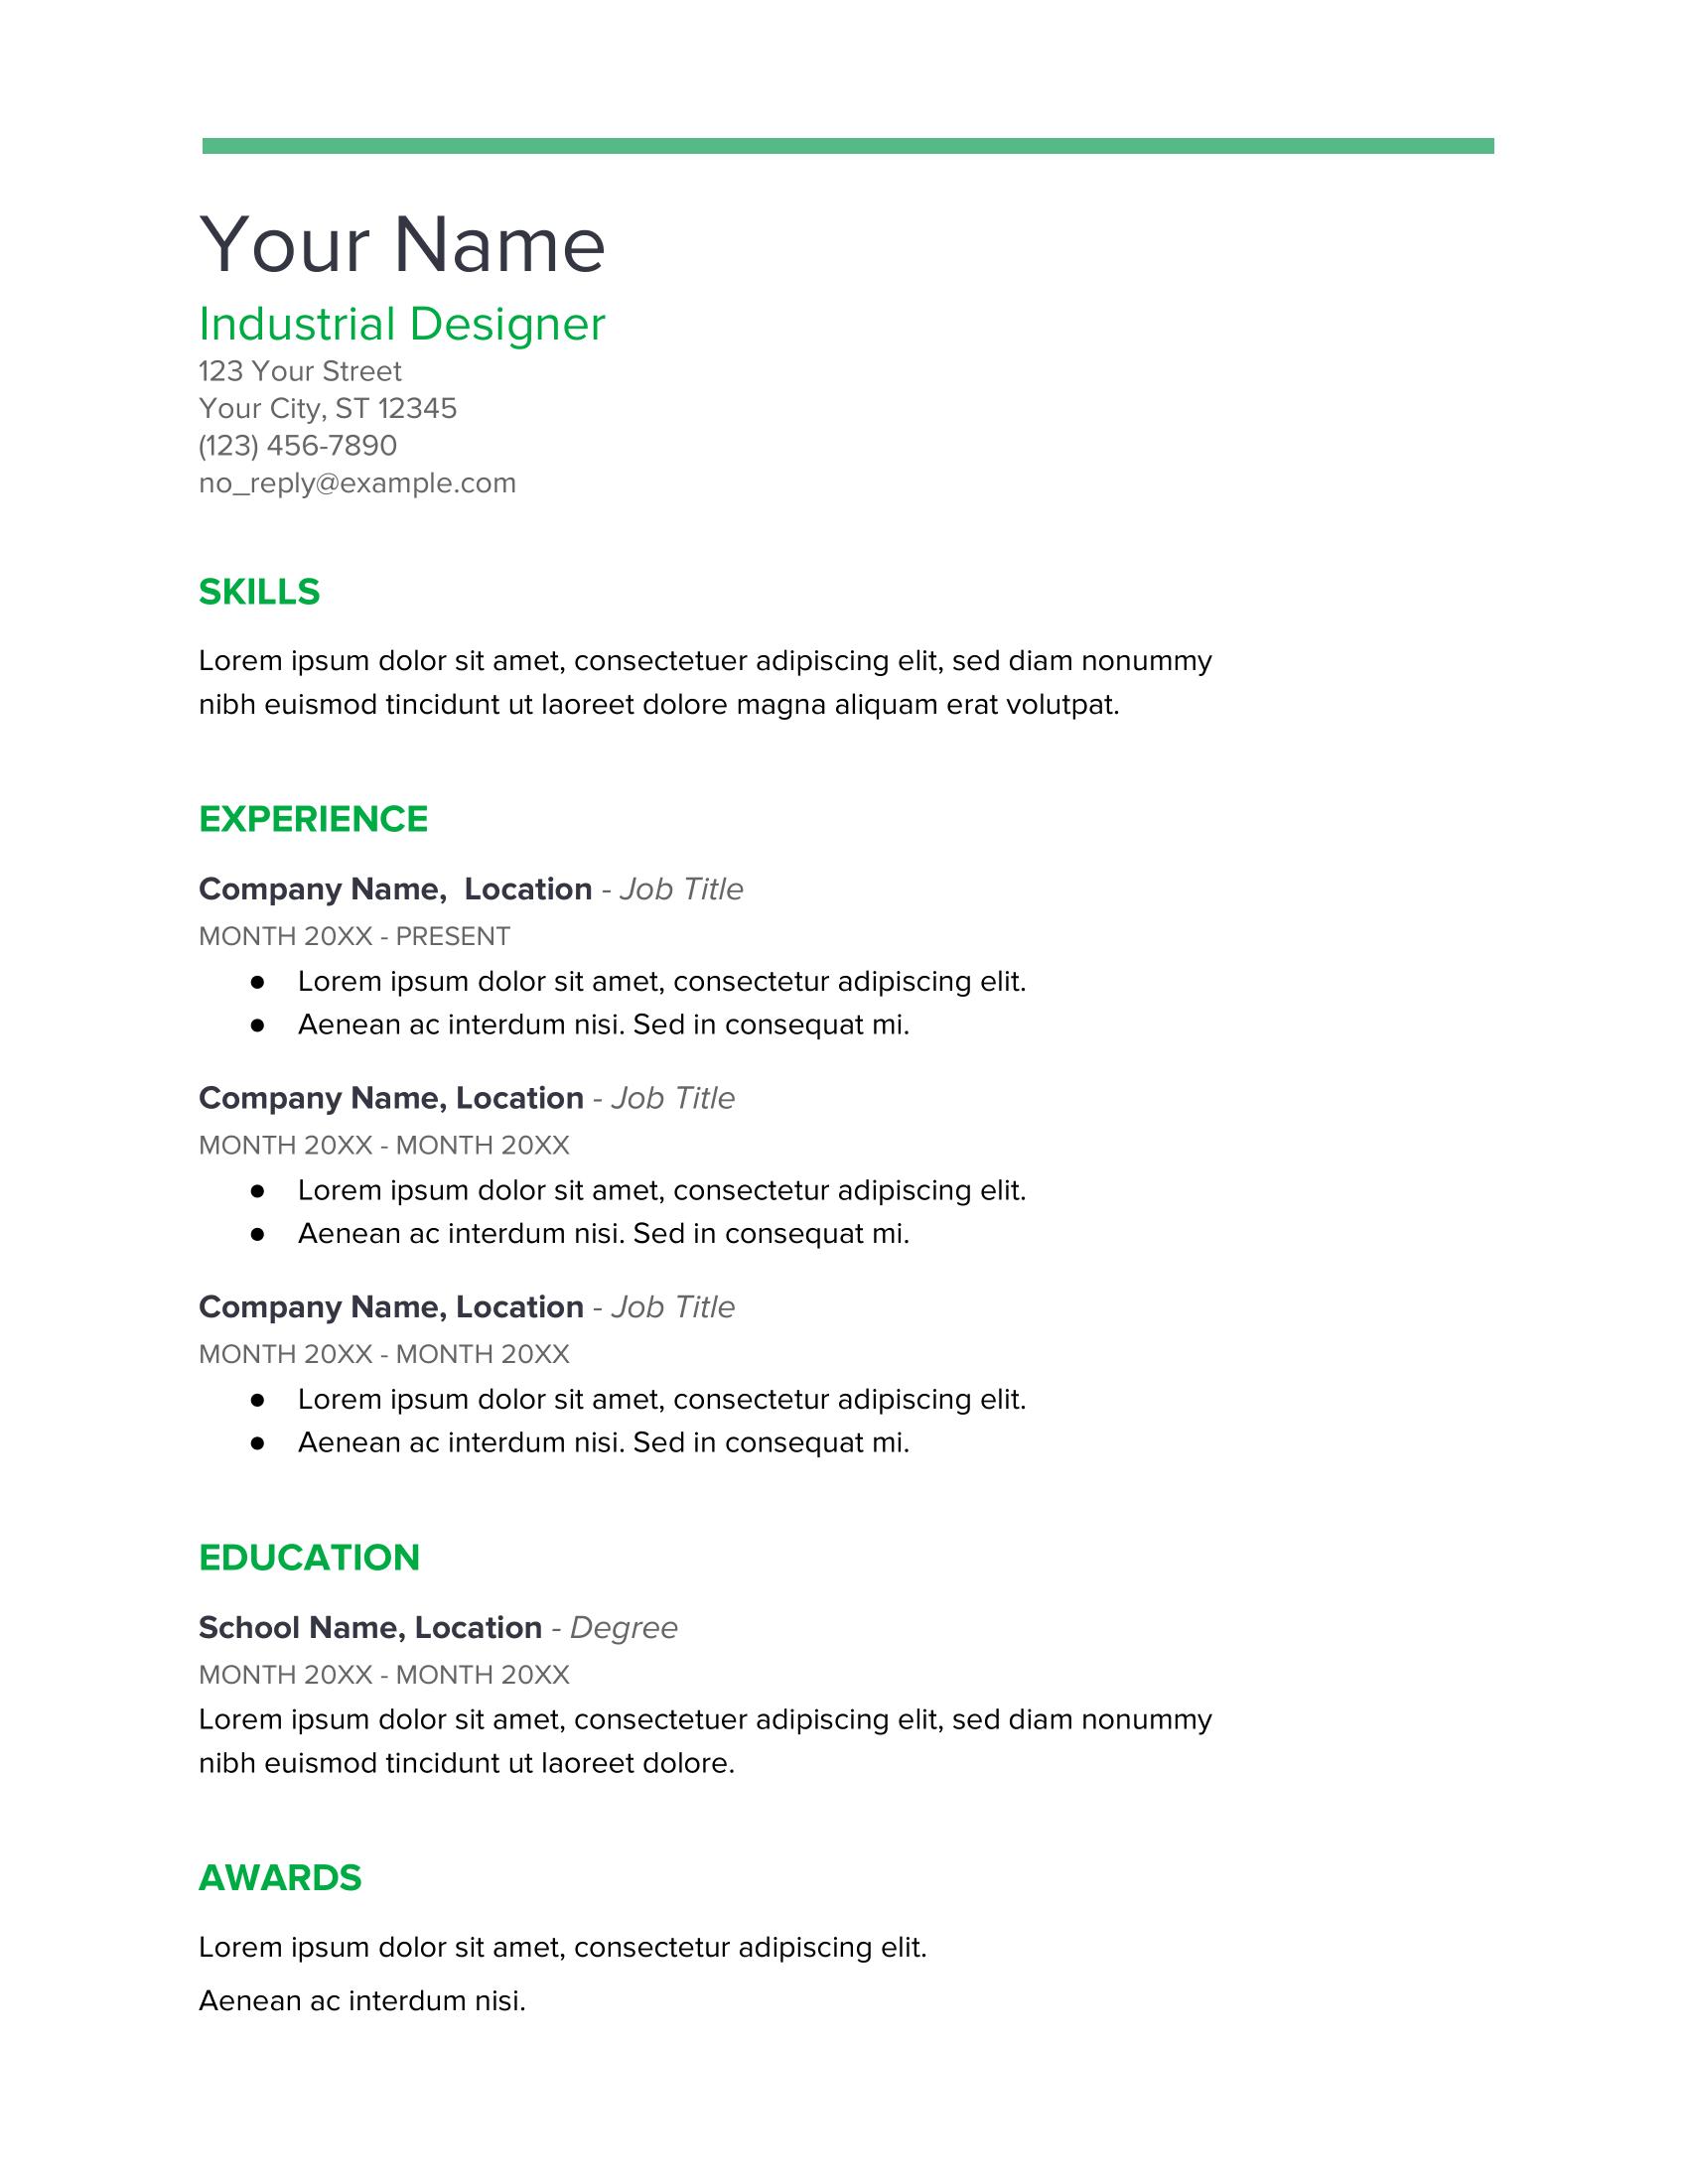 Spearmint Google Docs Resume Template